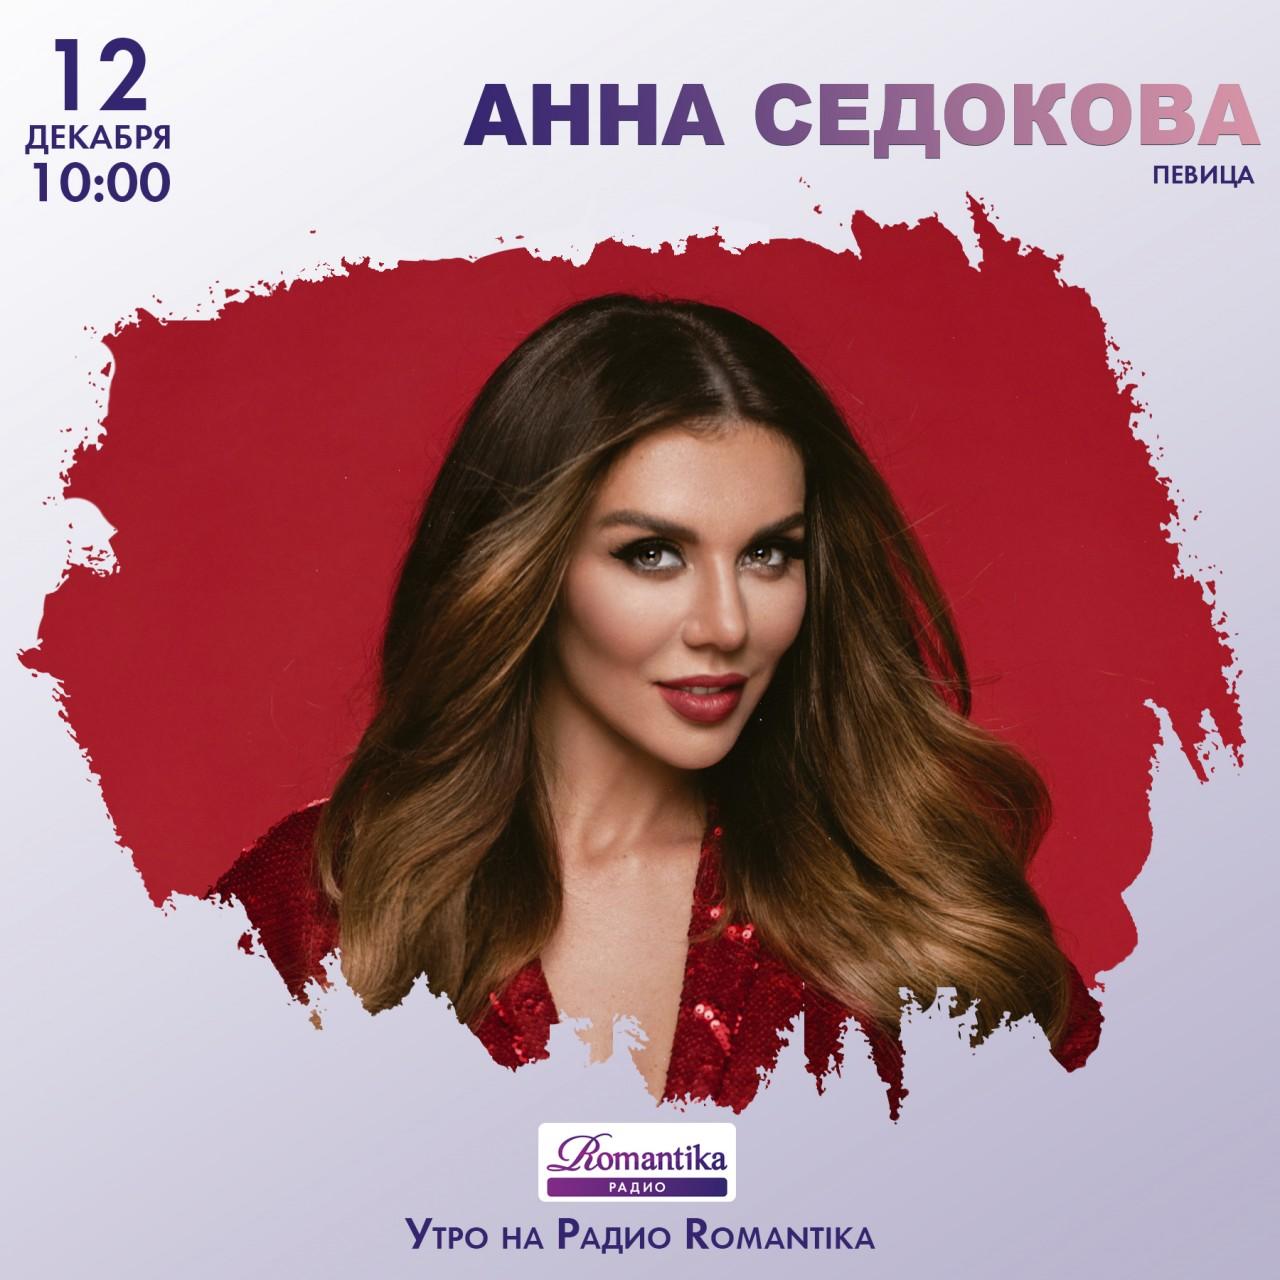 Радио Romantika: 12 декабря …